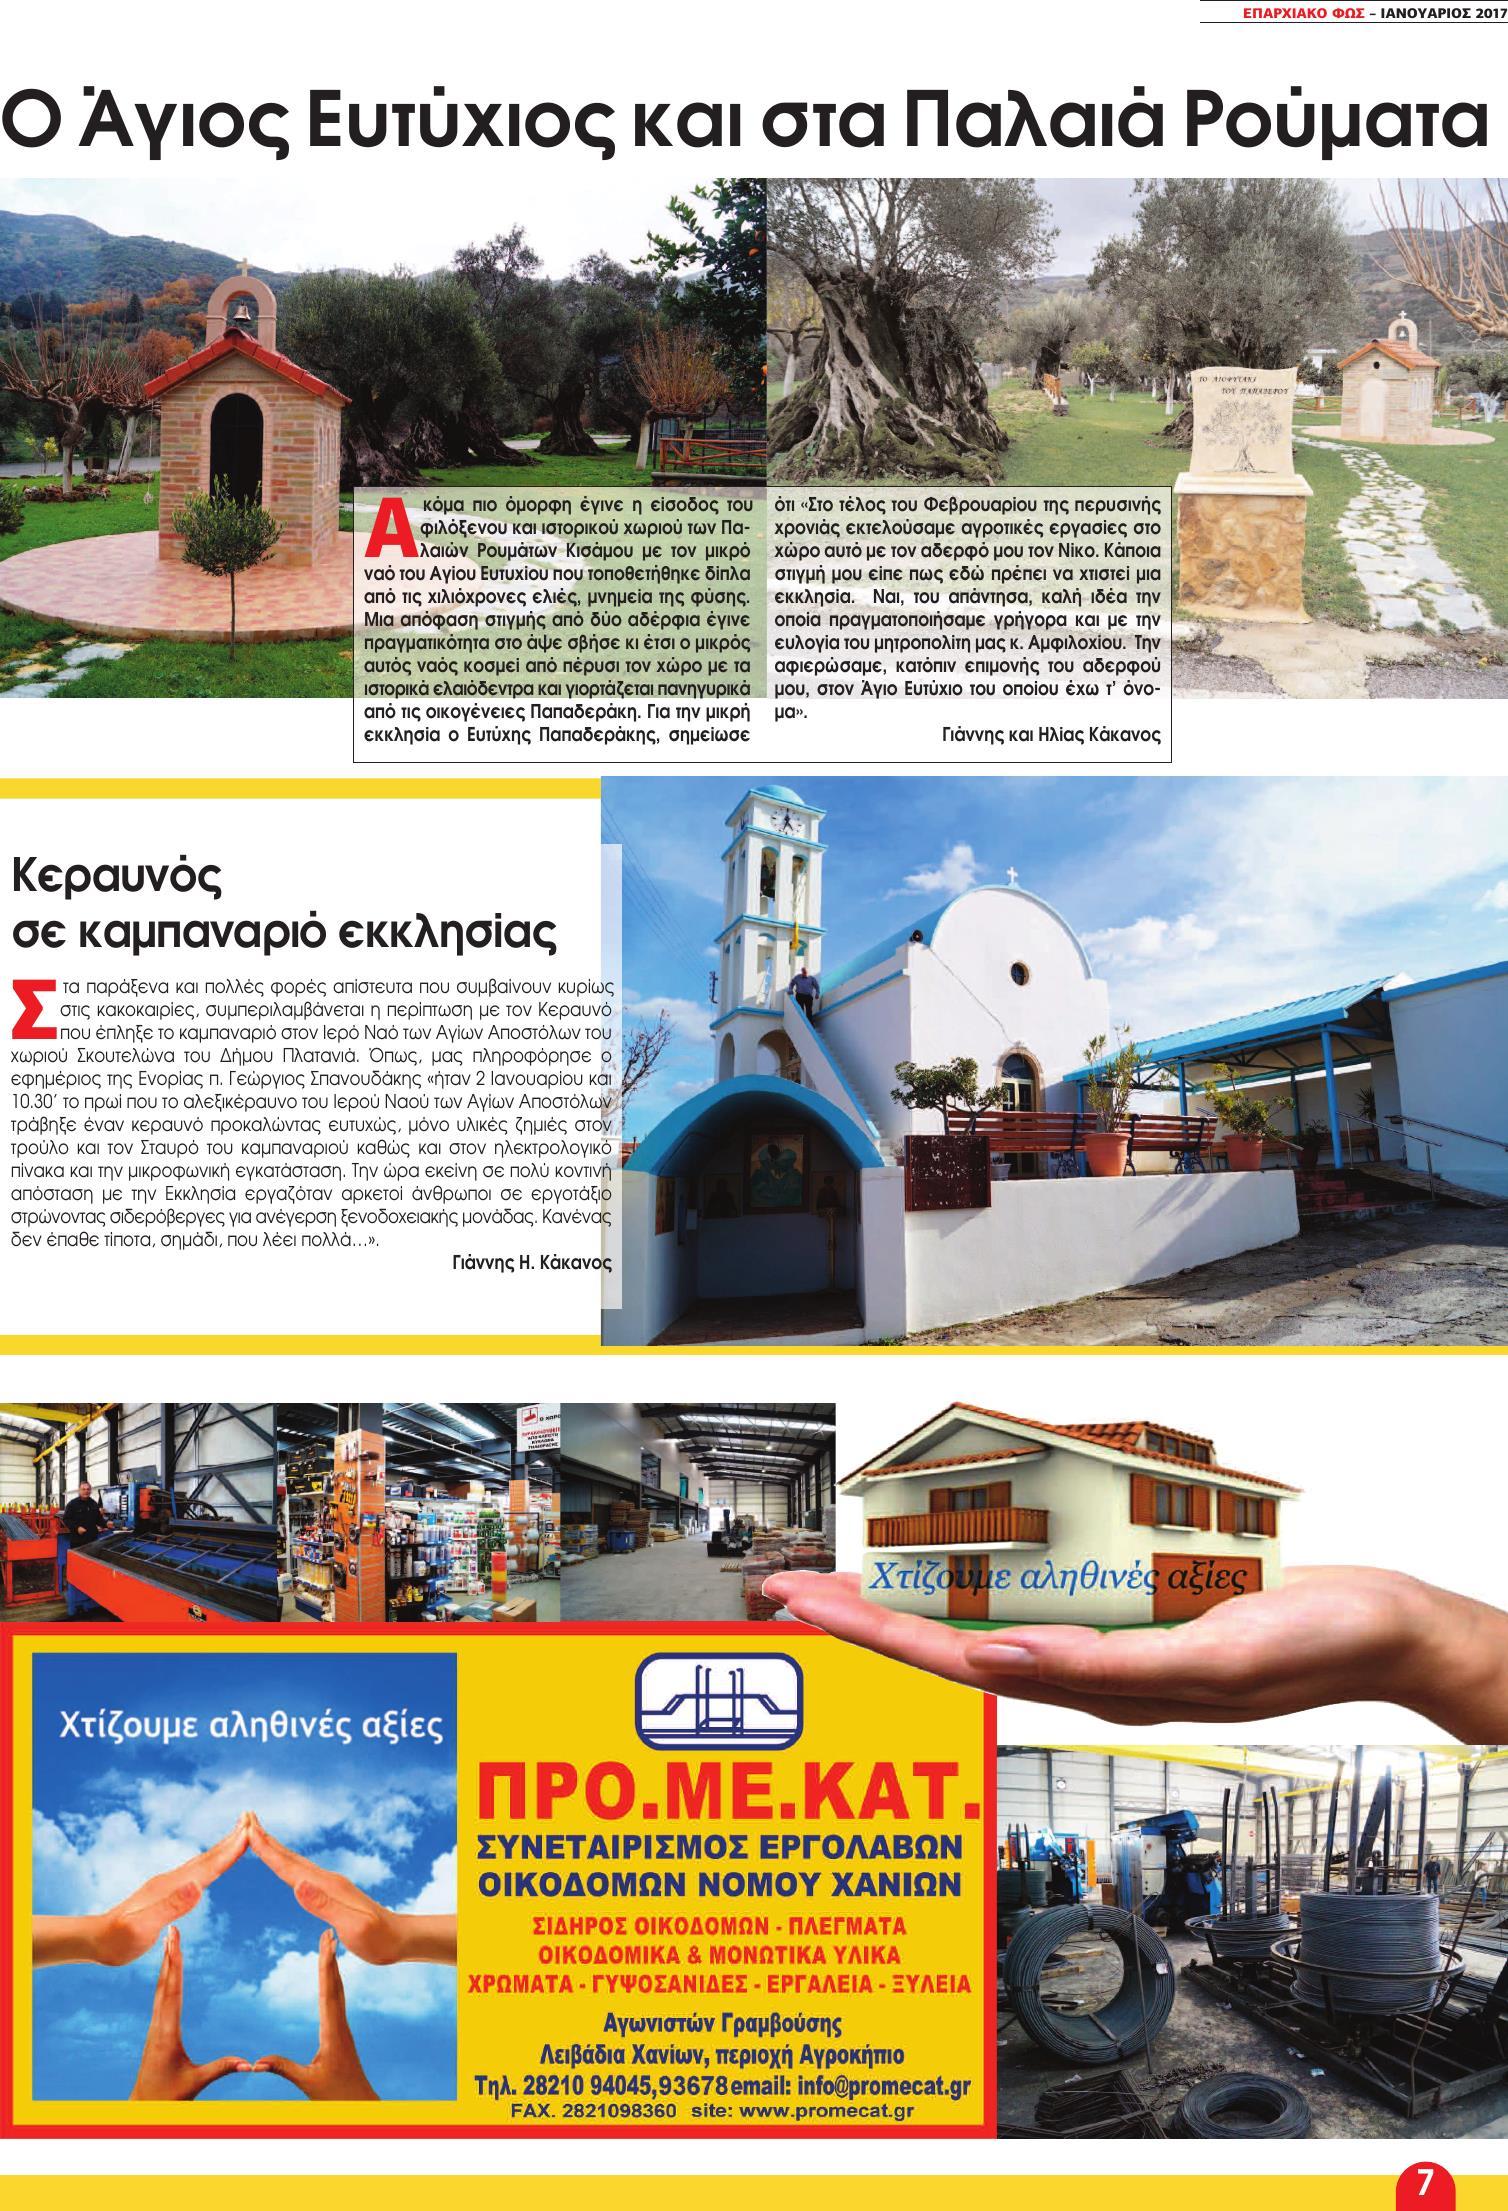 16 KAKANOS (Page 07)